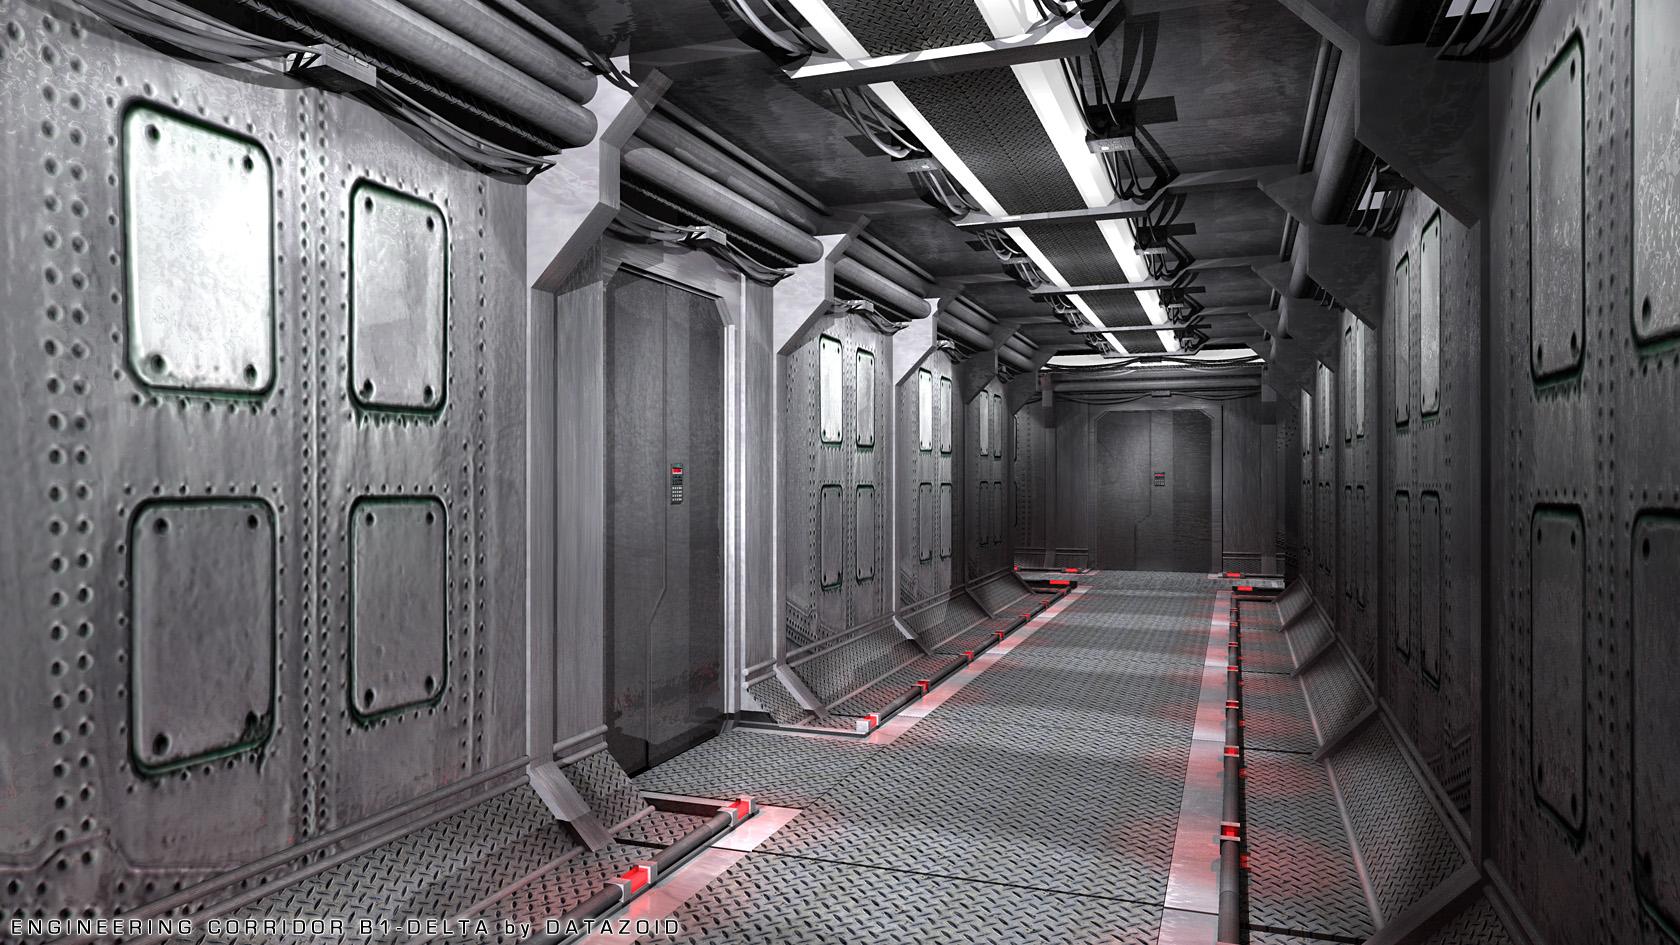 Engineering Corridor B-1 Delta by datazoid